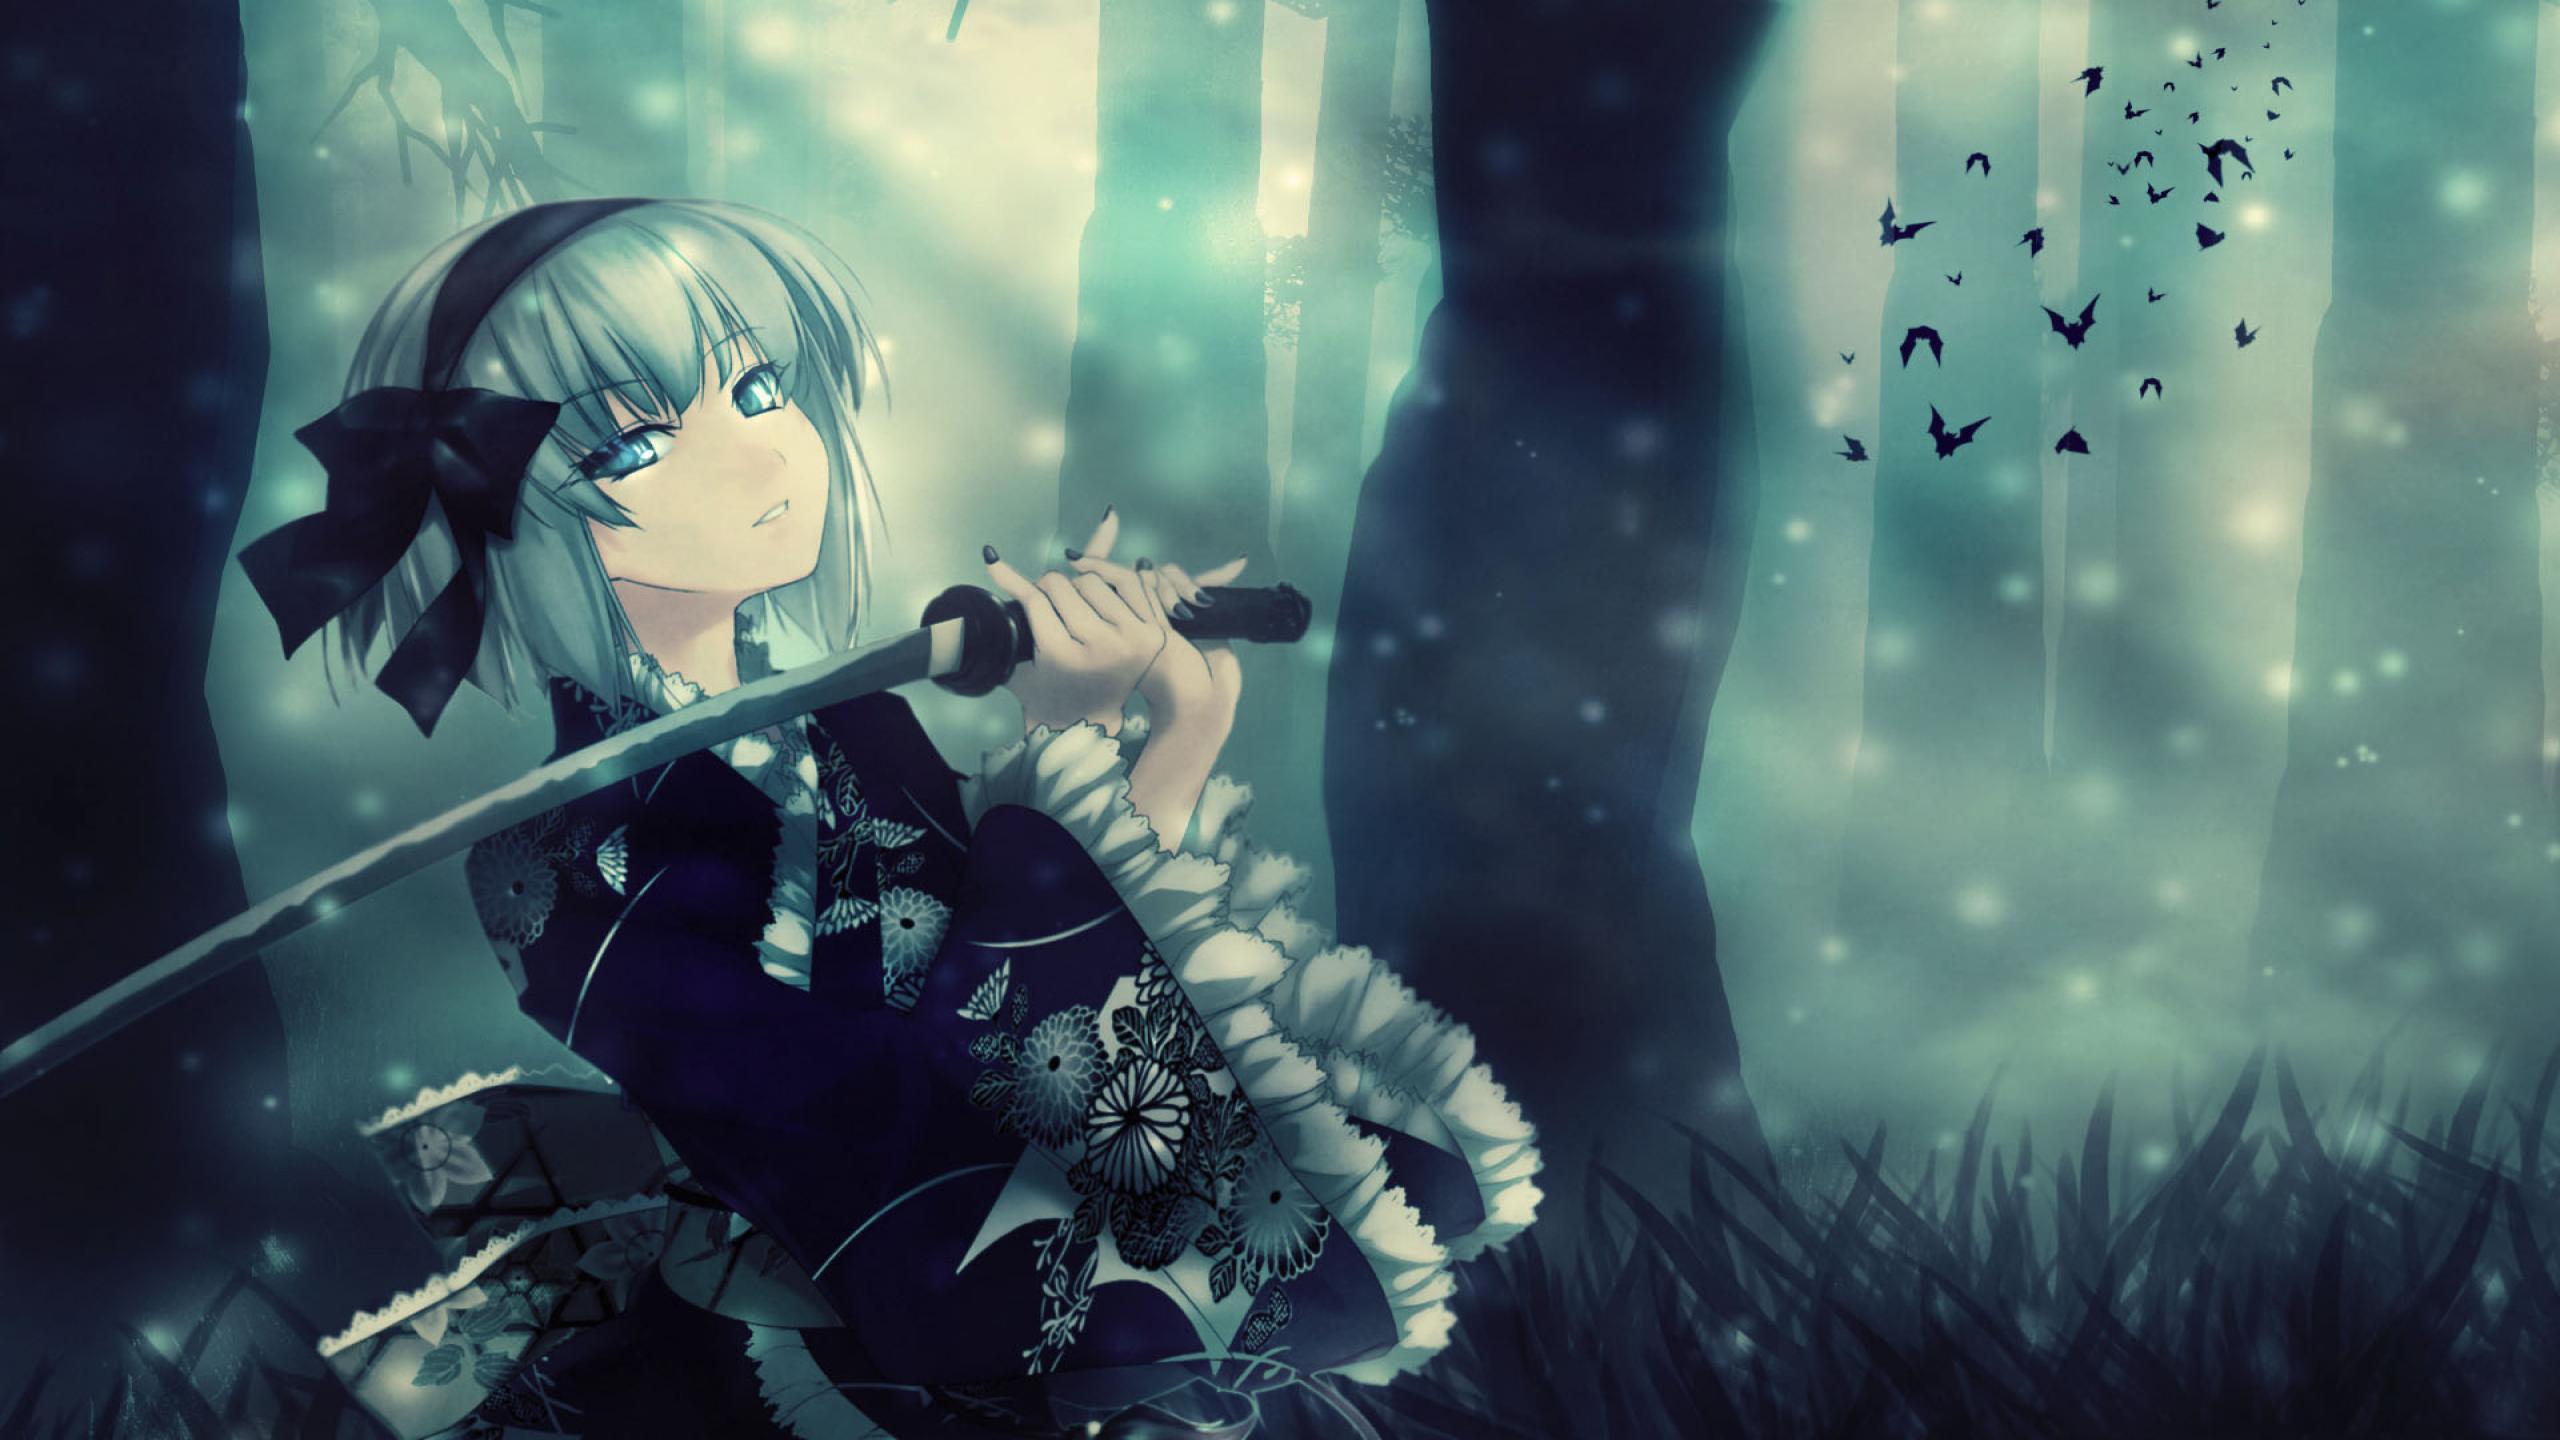 Free 3d Anime HD Wallpapers 2560x1440 Anime